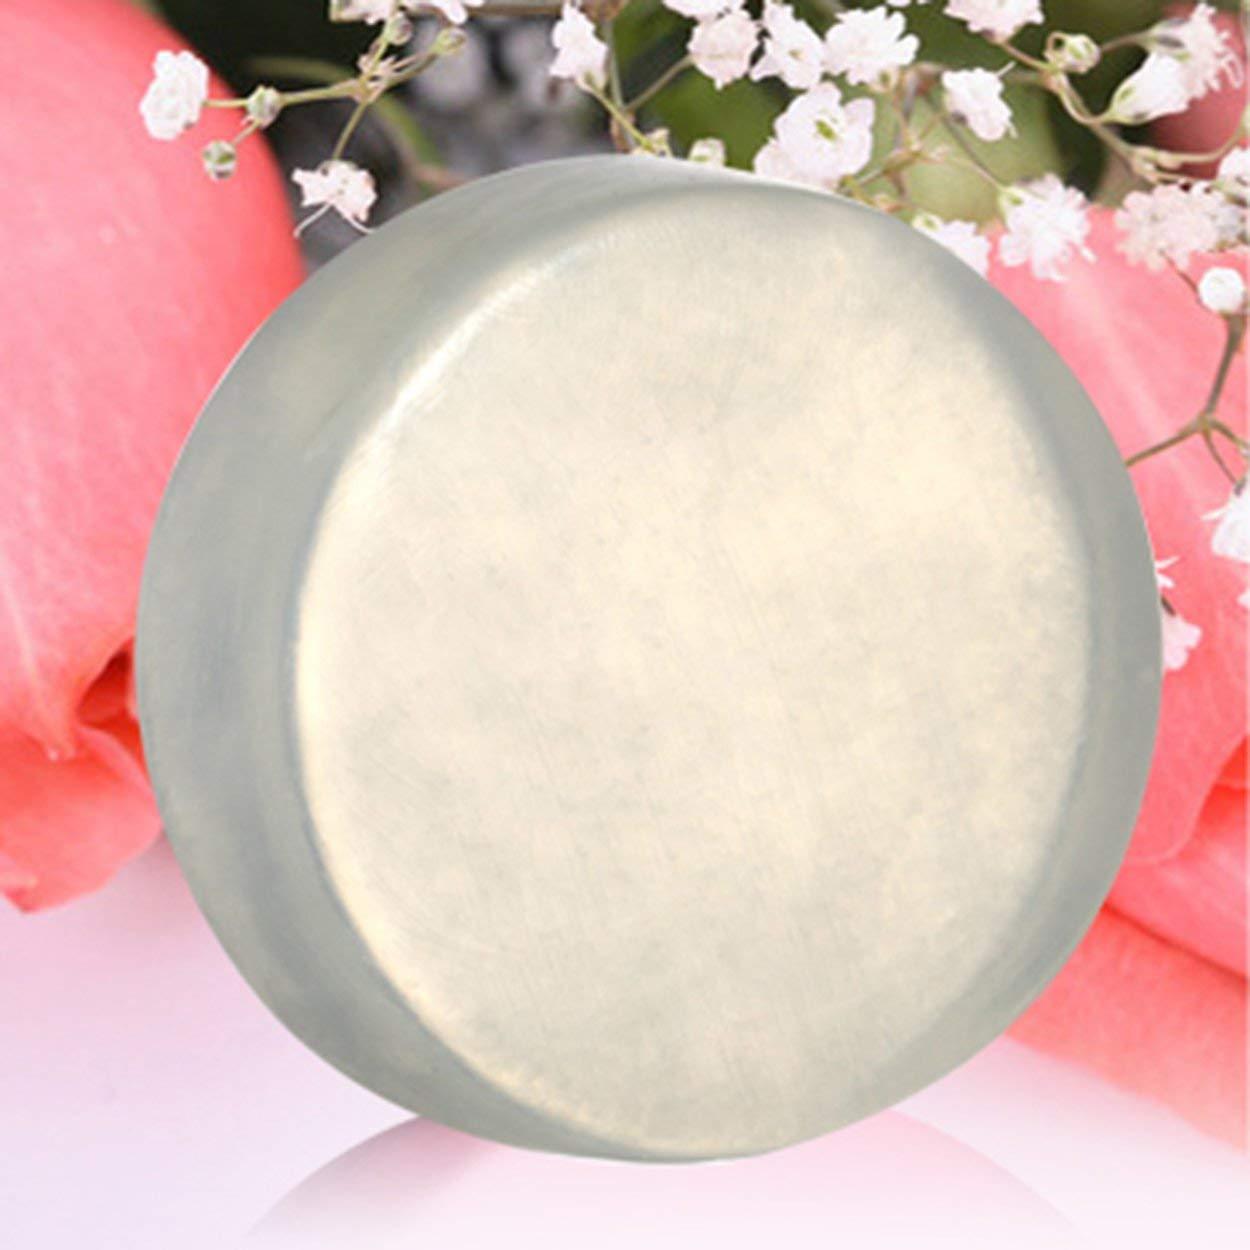 Losenlli 50g Enzima activa natural Jabón de cristal Jabón de ...